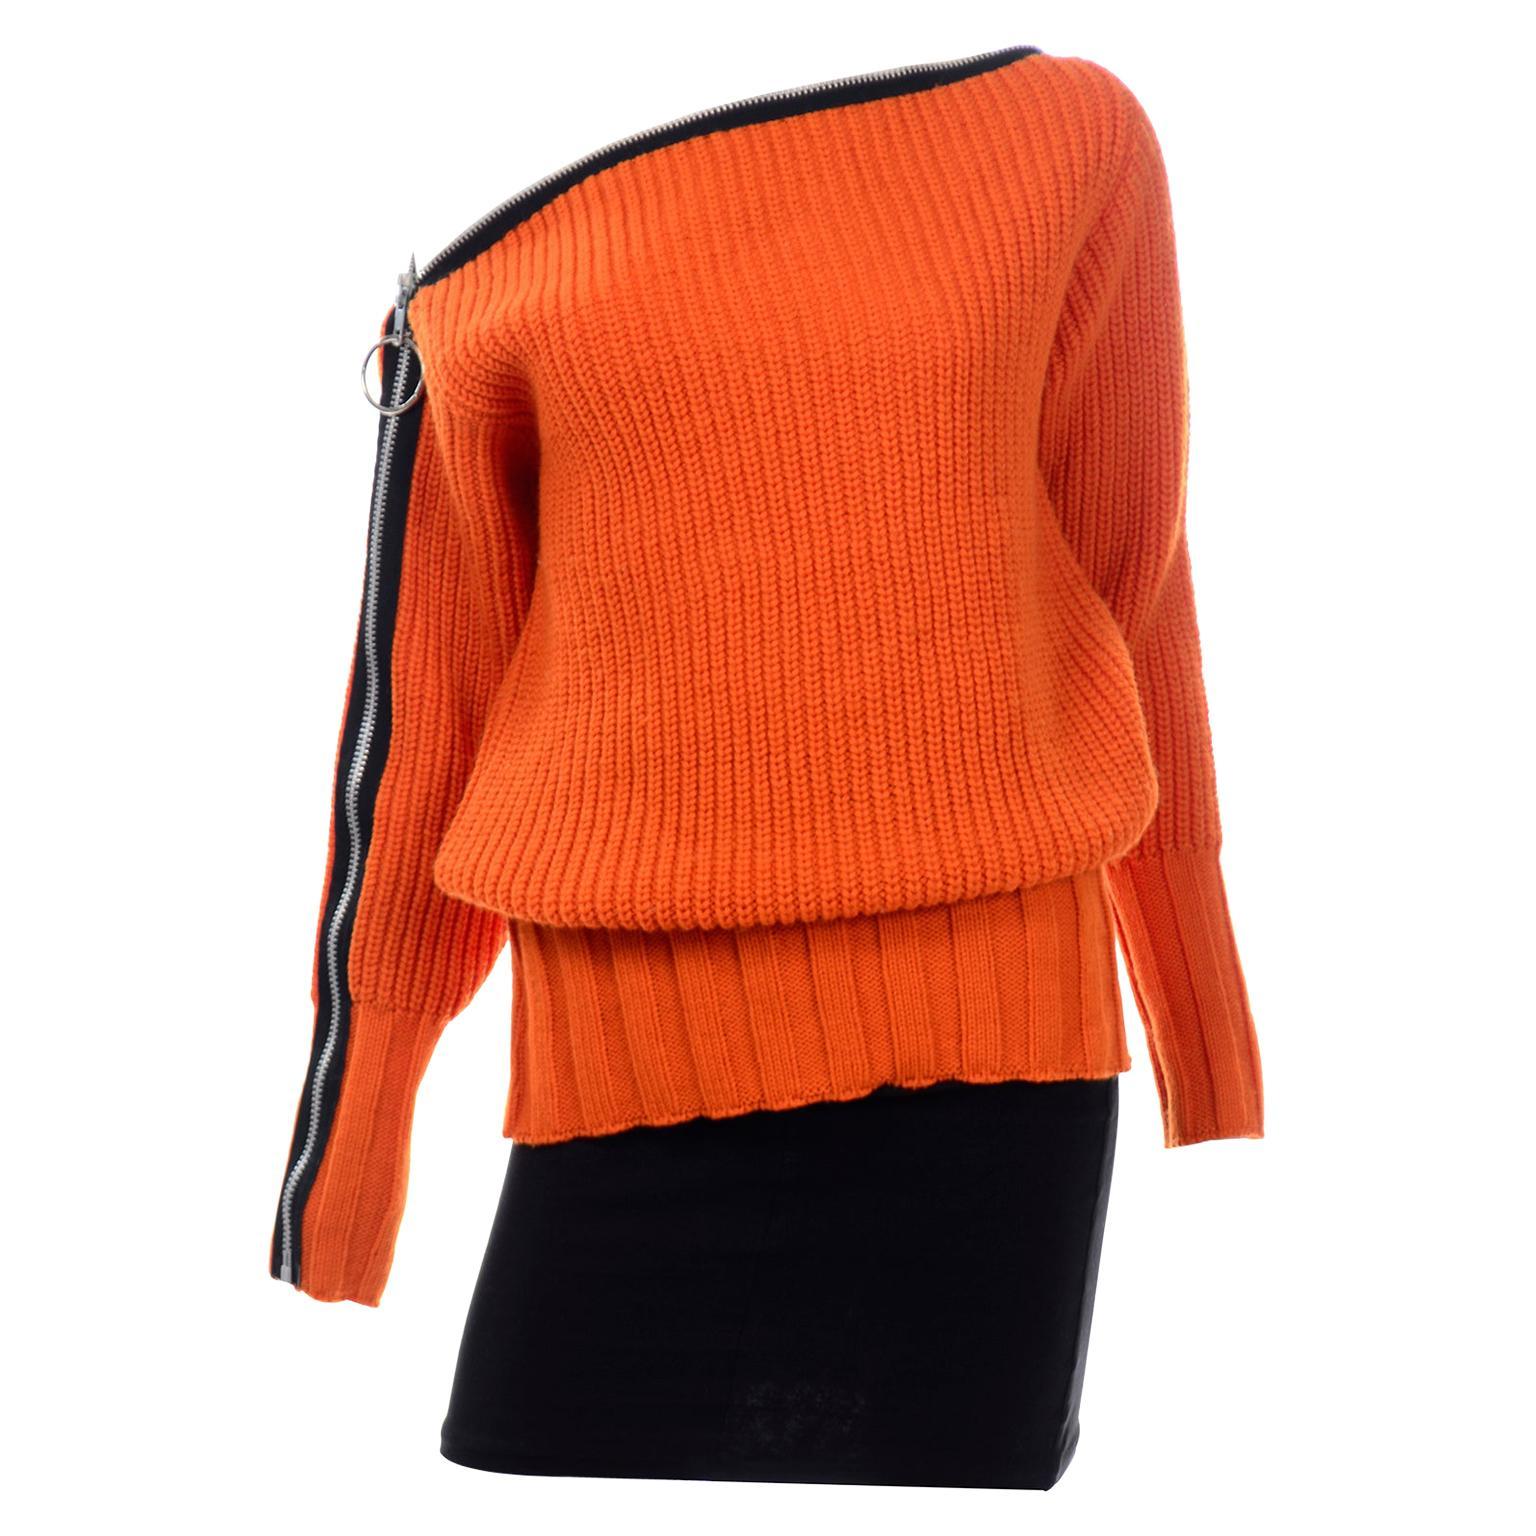 Betsey Johnson 1980s Orange Knit Zipper Oversized Sweater W Black Mini Skirt